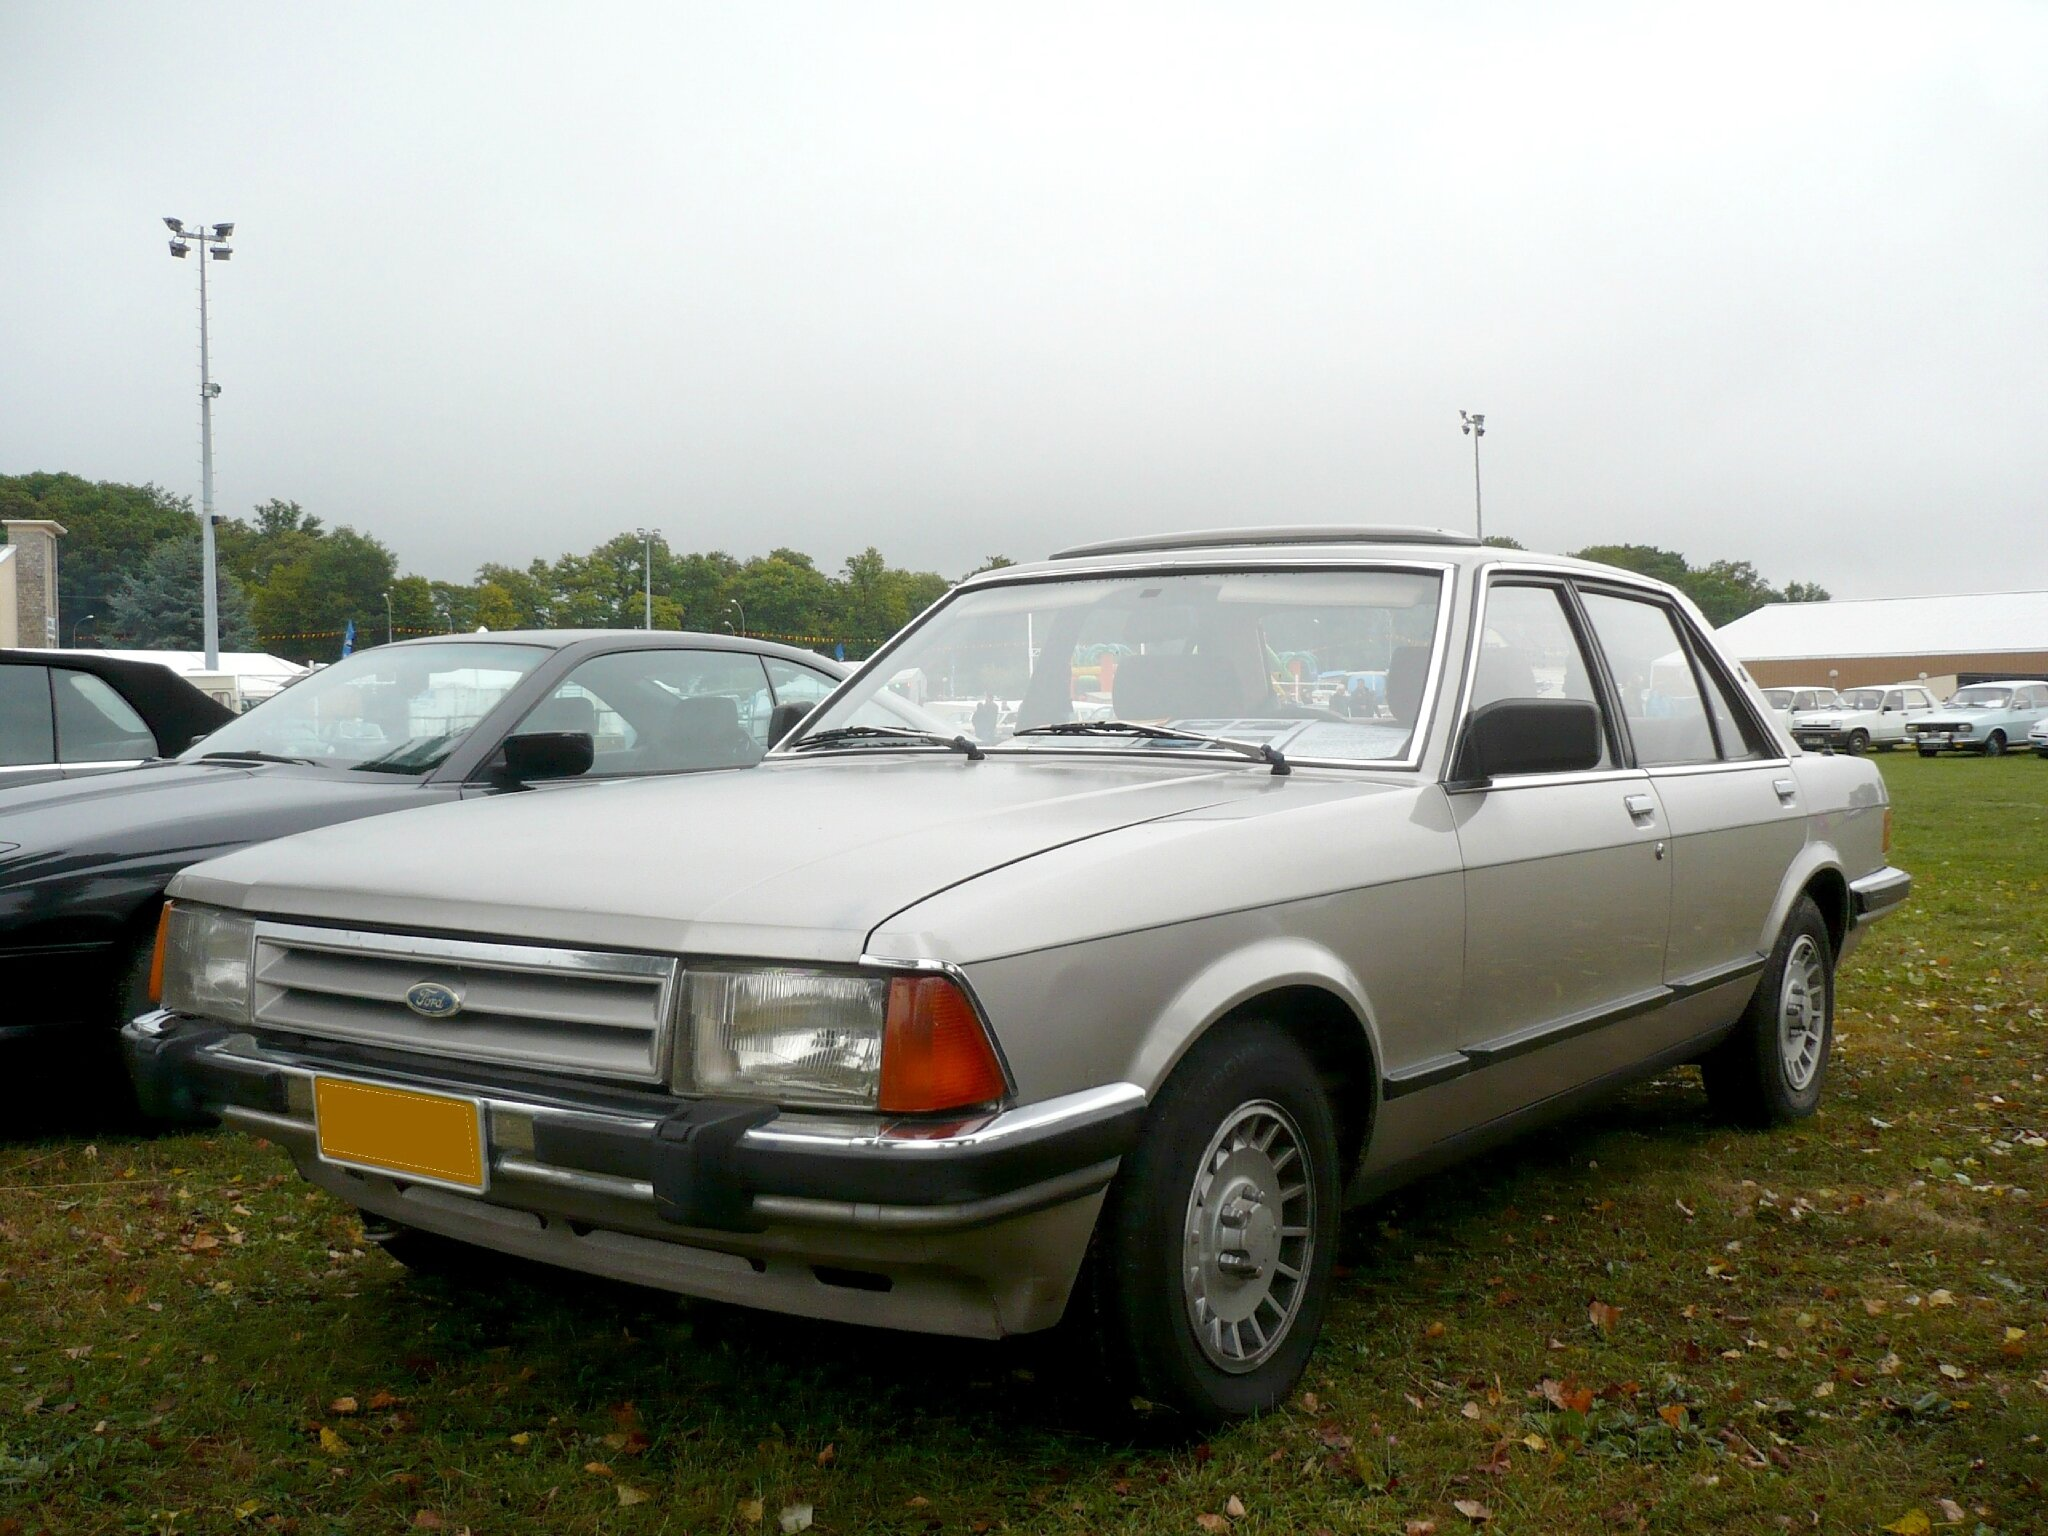 FORD Granada 2.5D Mk2 berline 4 portes 1985 Créhange (1)